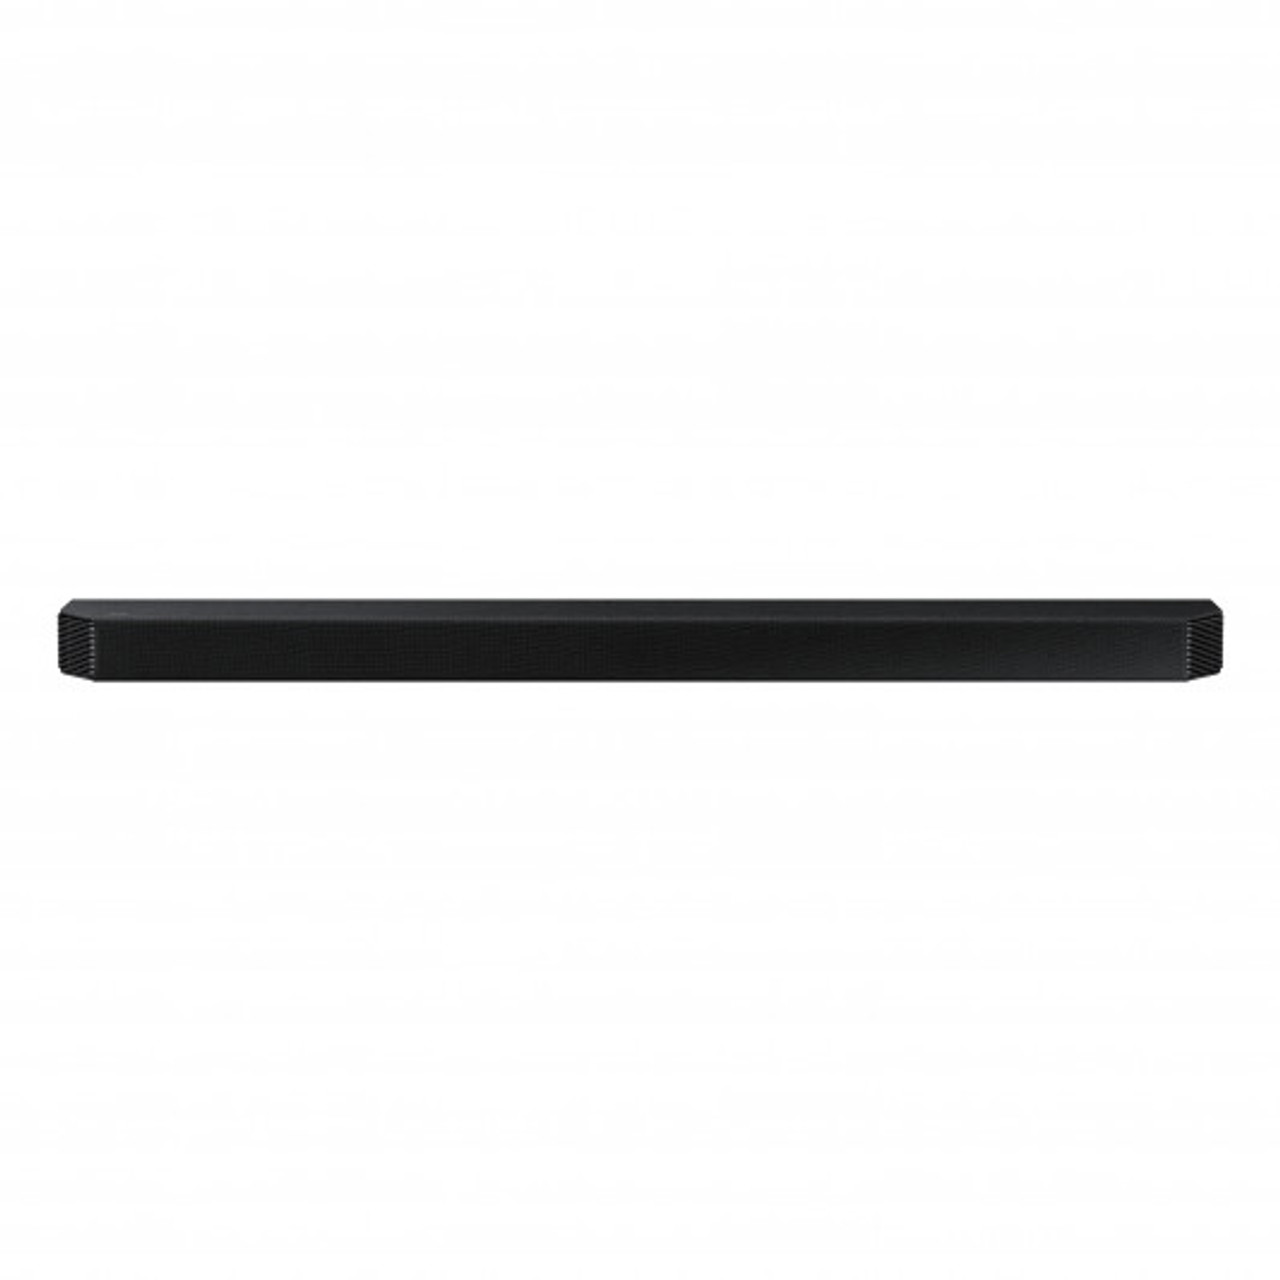 Samsung HW-Q950A 11.1.4 Channel Home Theatre Soundbar (2021) - Black